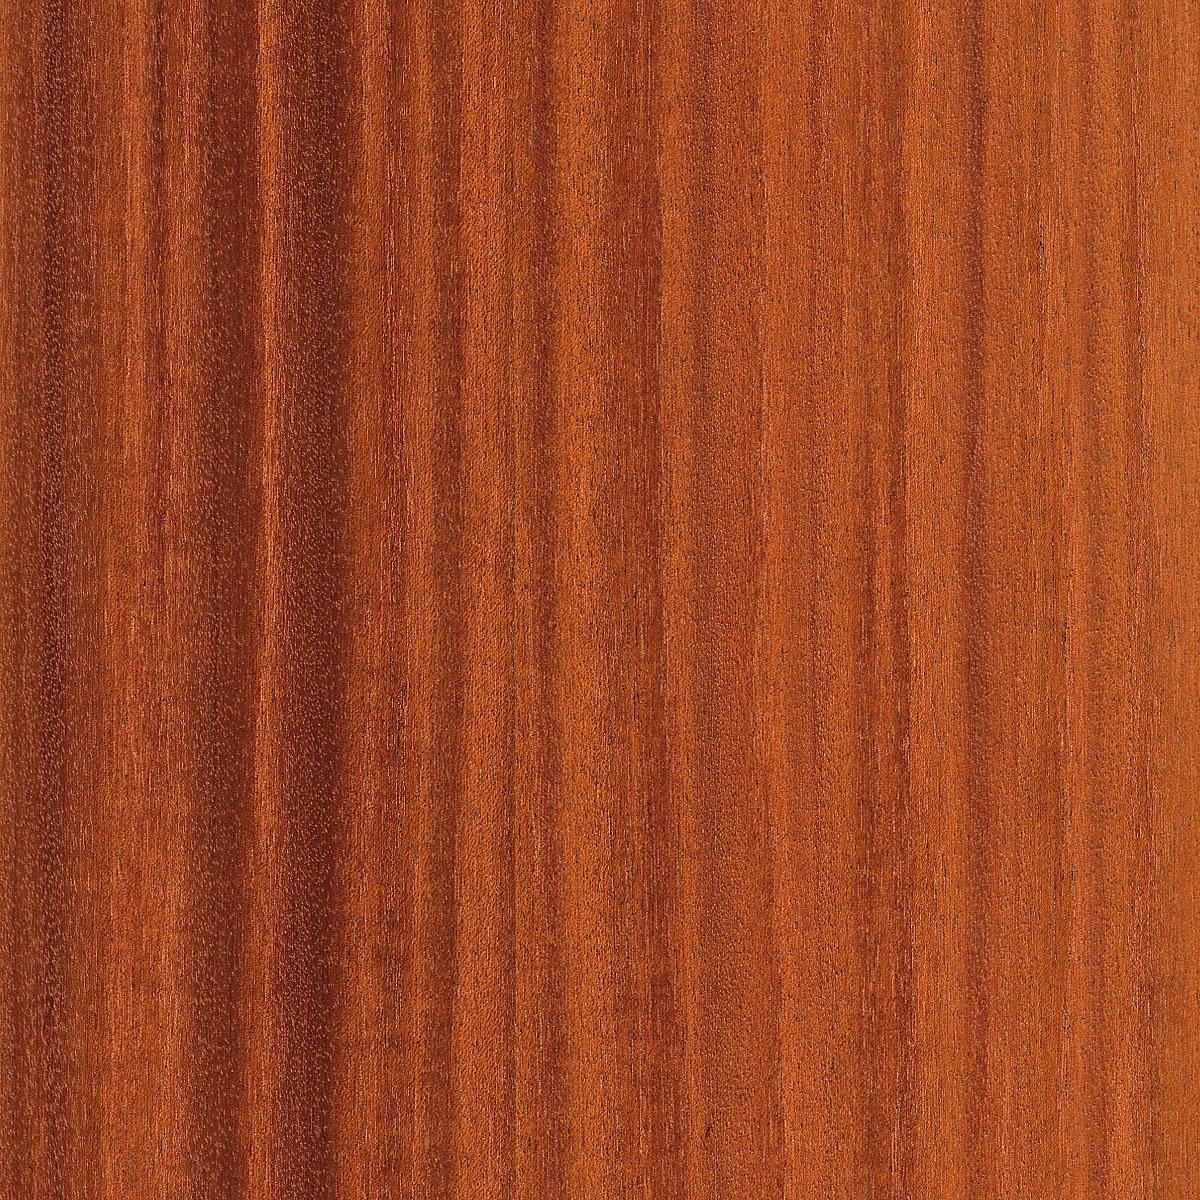 Mahogany, African, Qtr Cut, Ribbon Striped, 48x96 2 Ply(Woodback) Wood Veneer Sheet by Wood-All